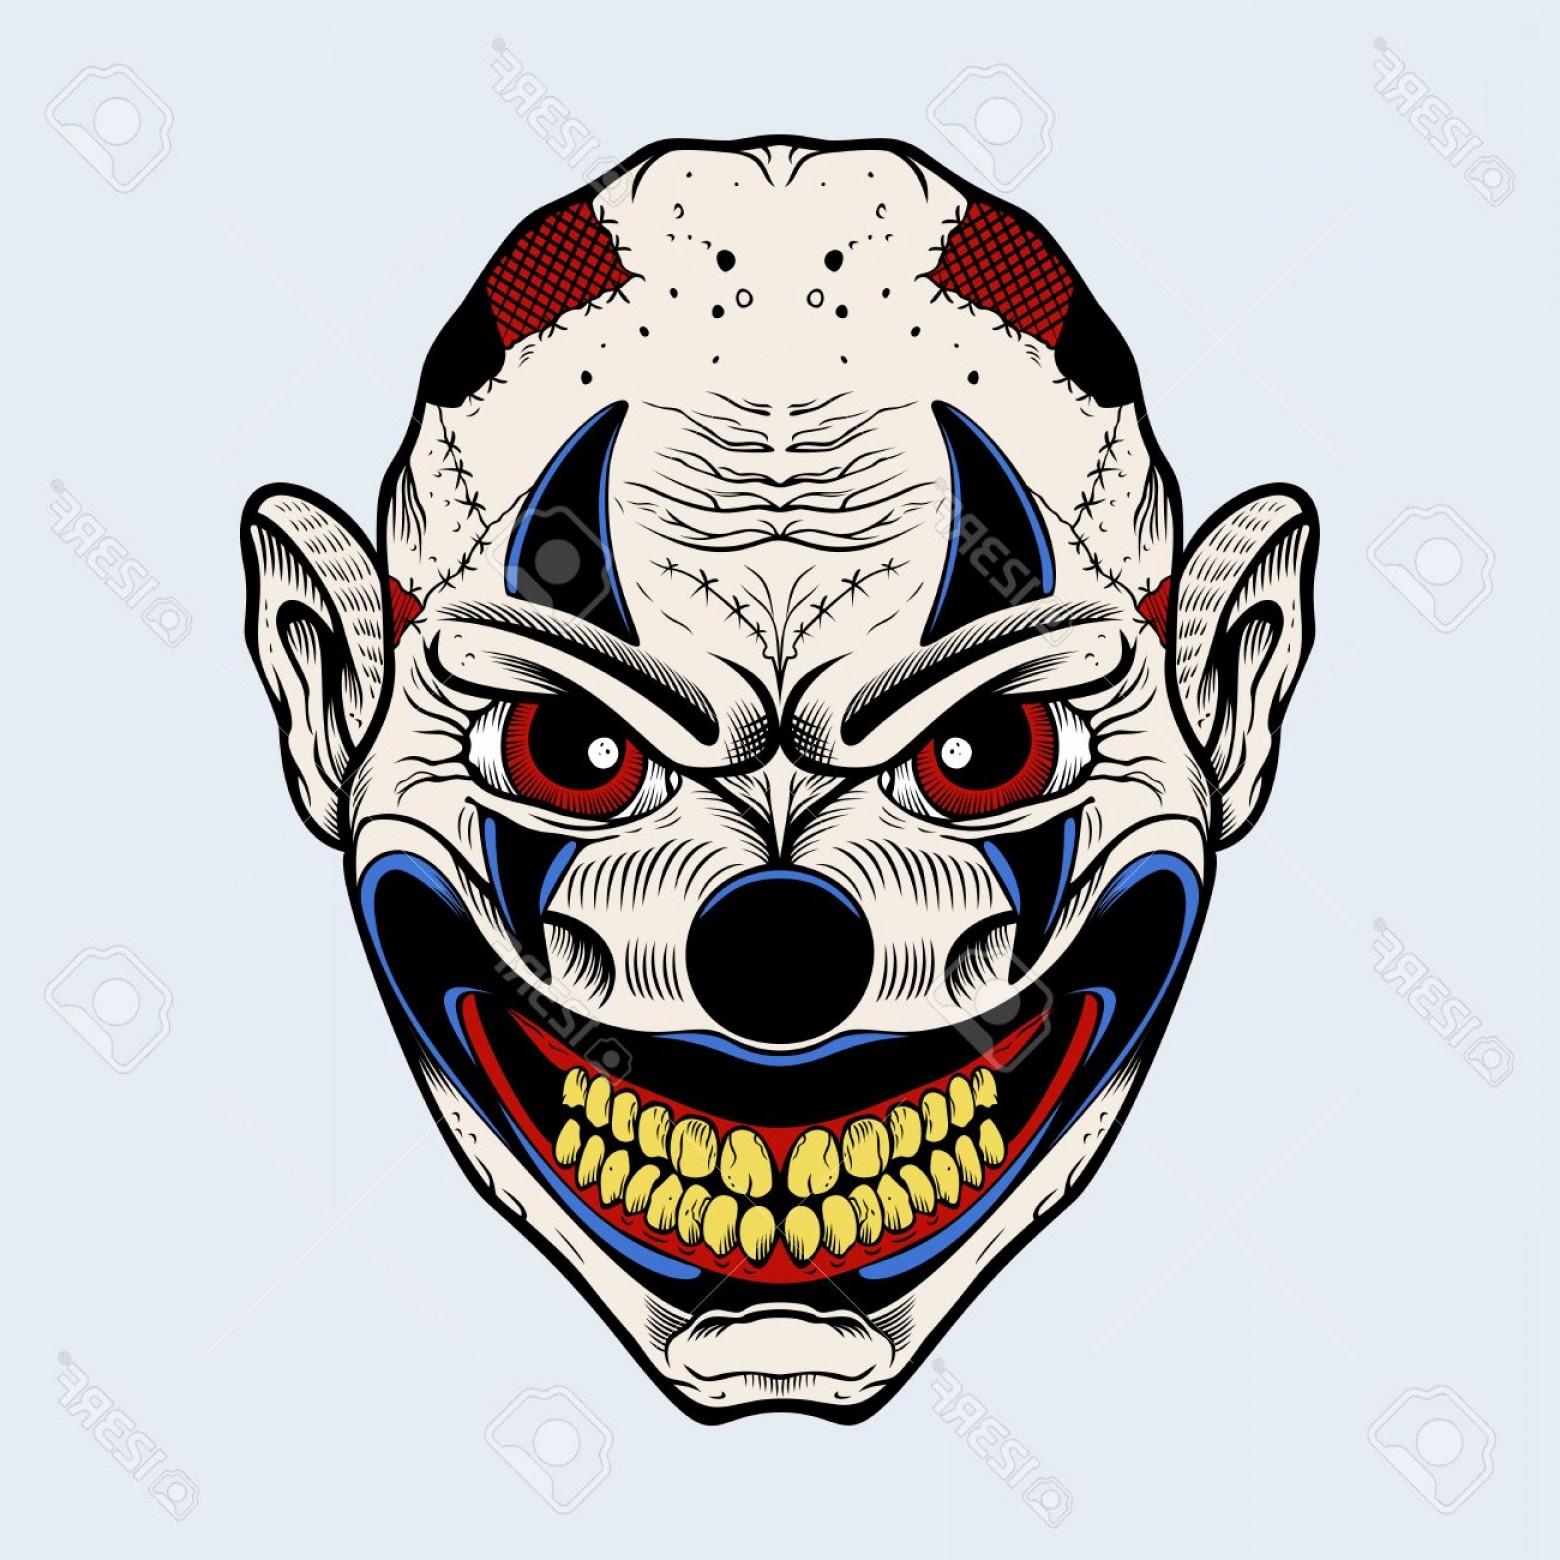 1560x1560 Creepy Clown Vector Createmepink